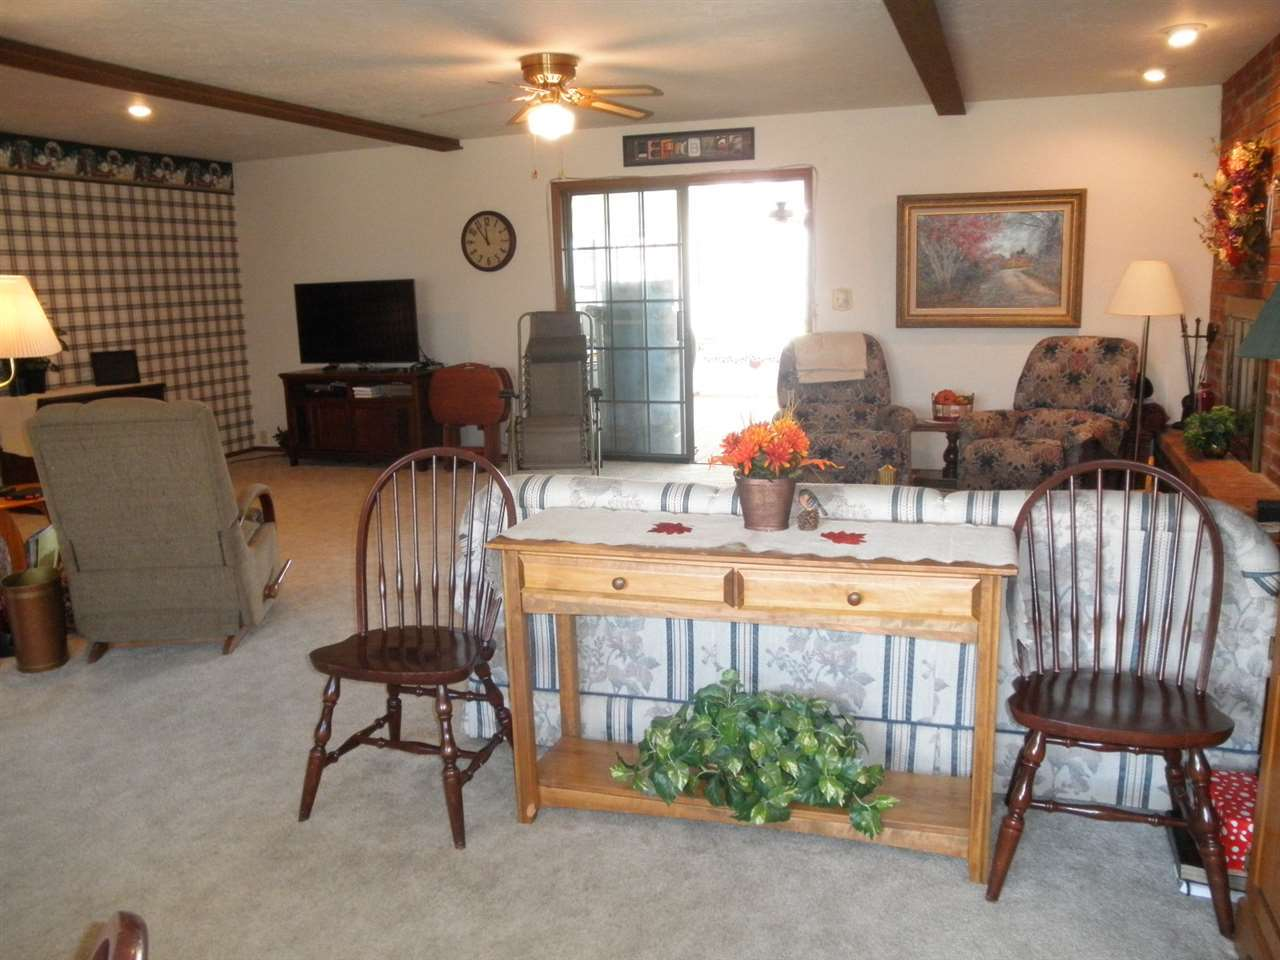 Sold Cross Sale W/ MLS | 1275 S Enterprise Road  Ponca City, OK 74604 7